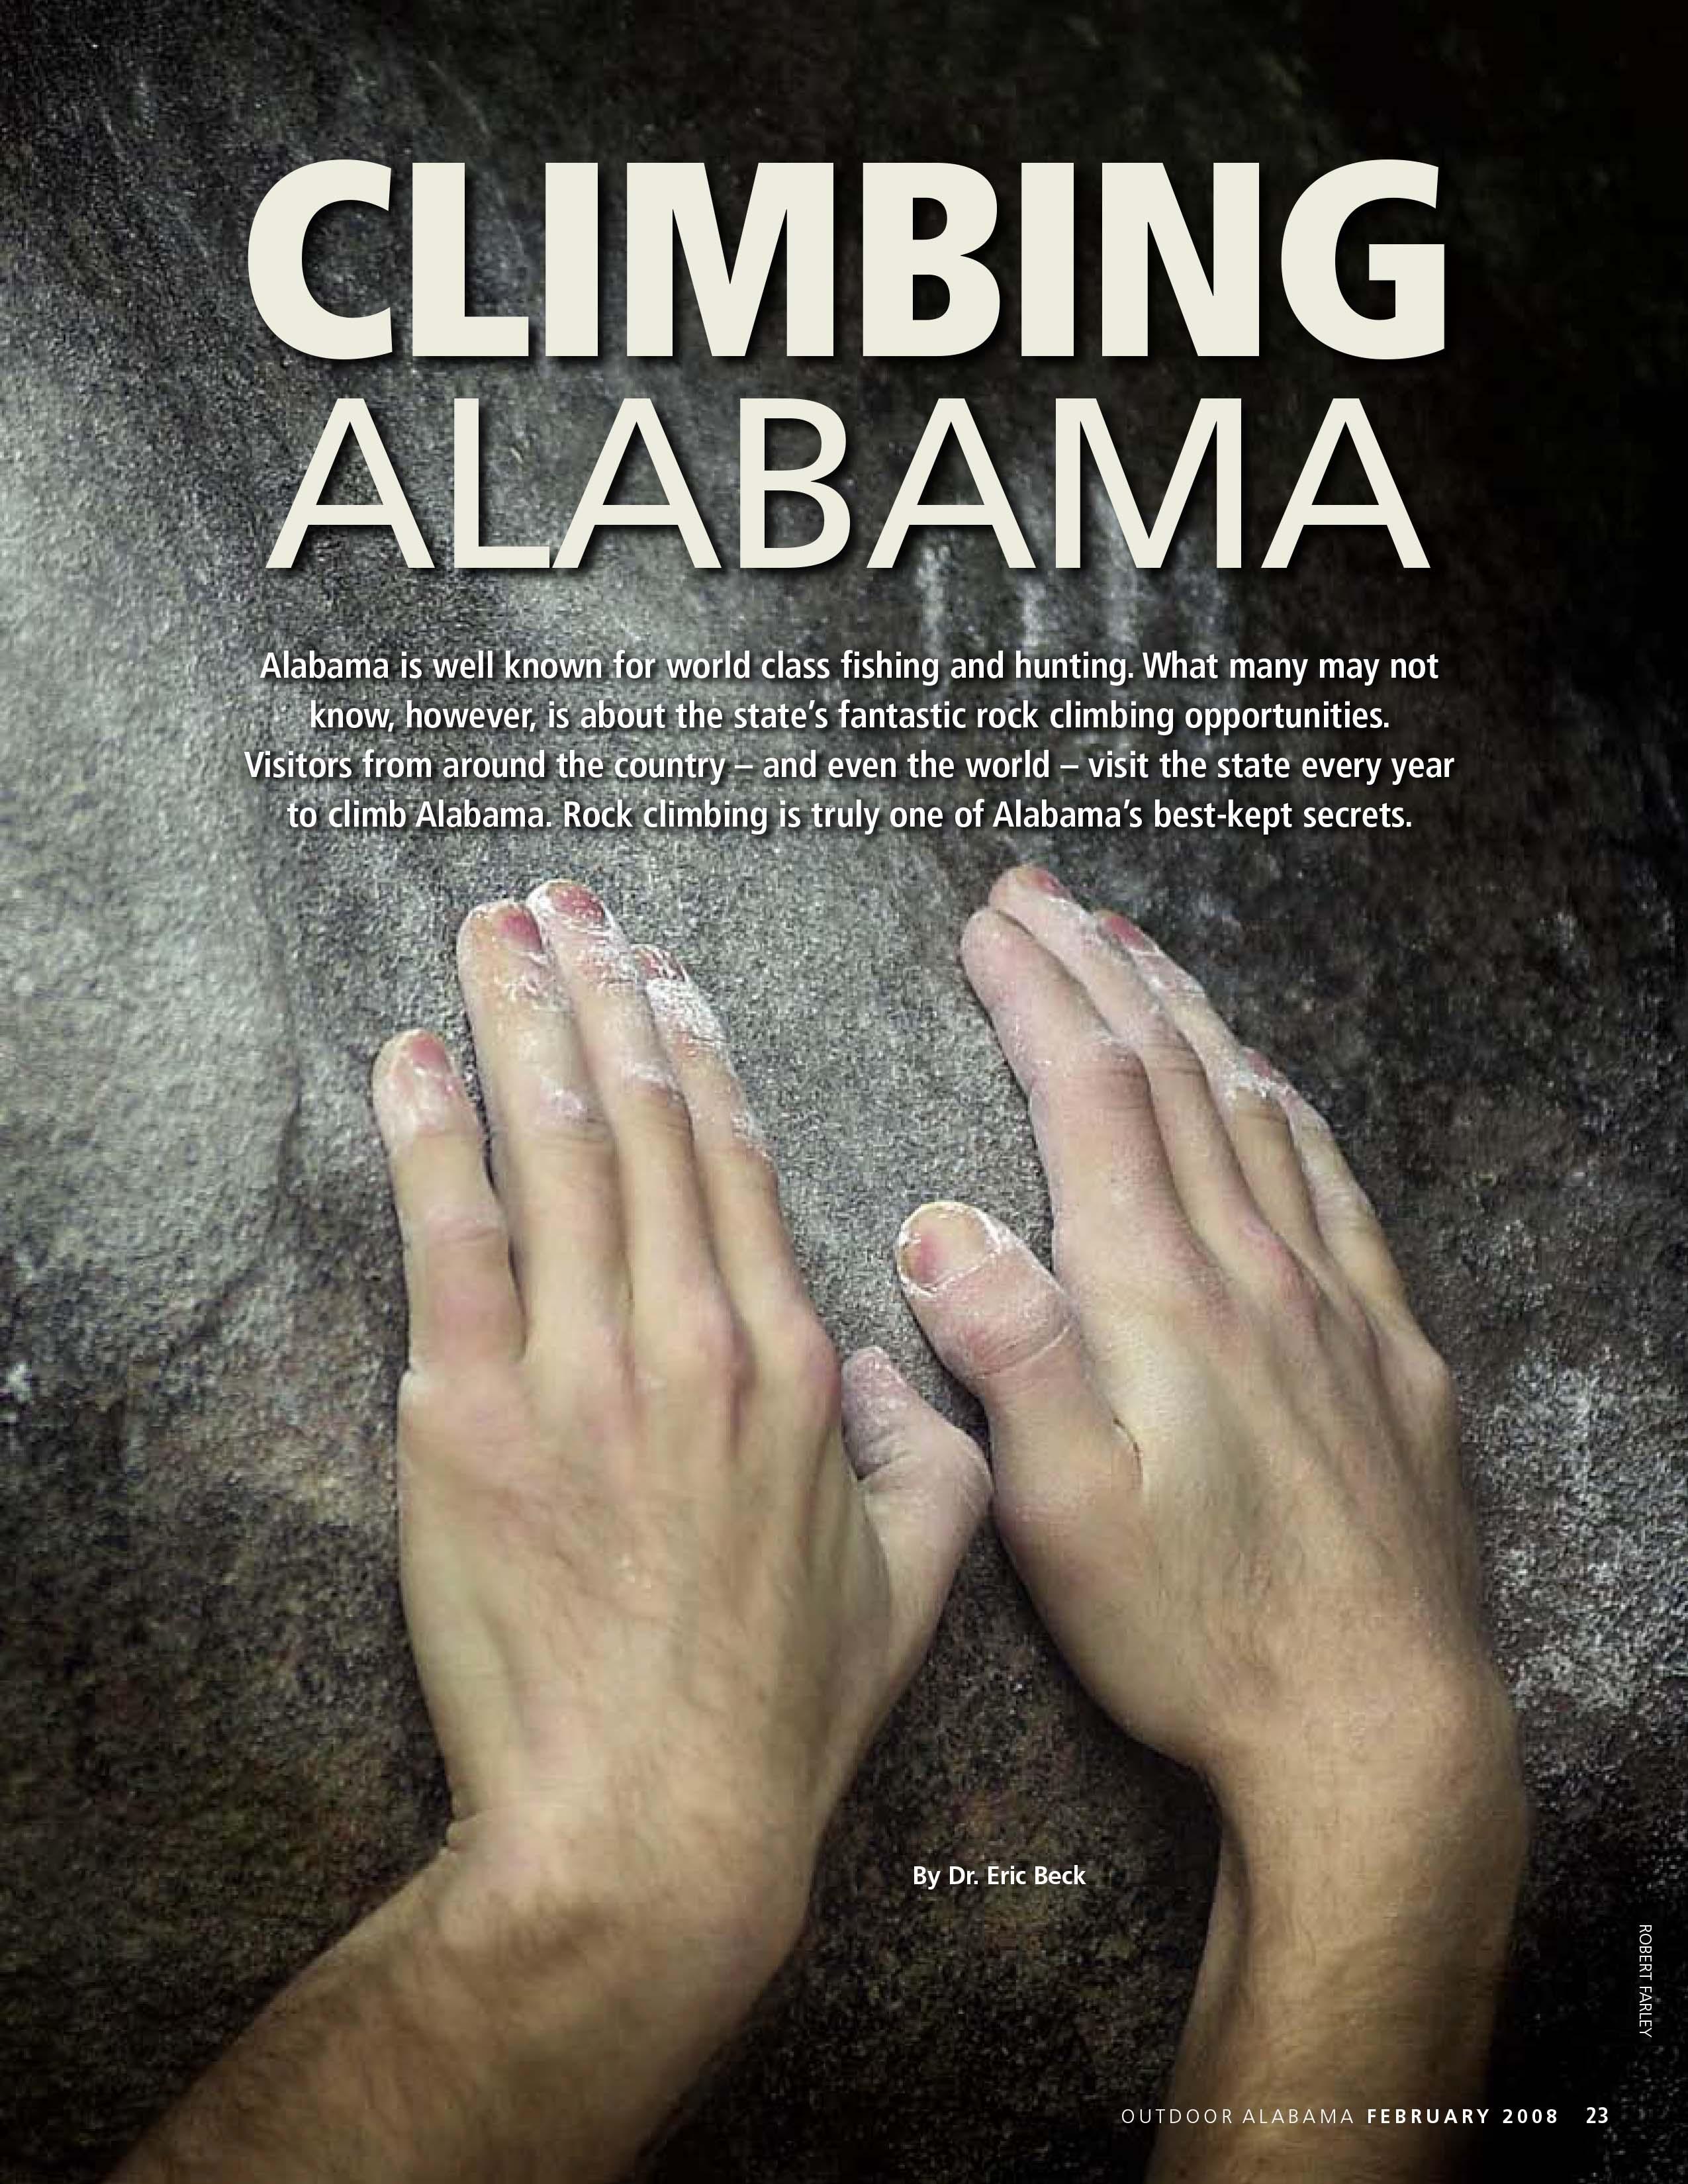 Climbing Alabama By Dr. Eric Baeck